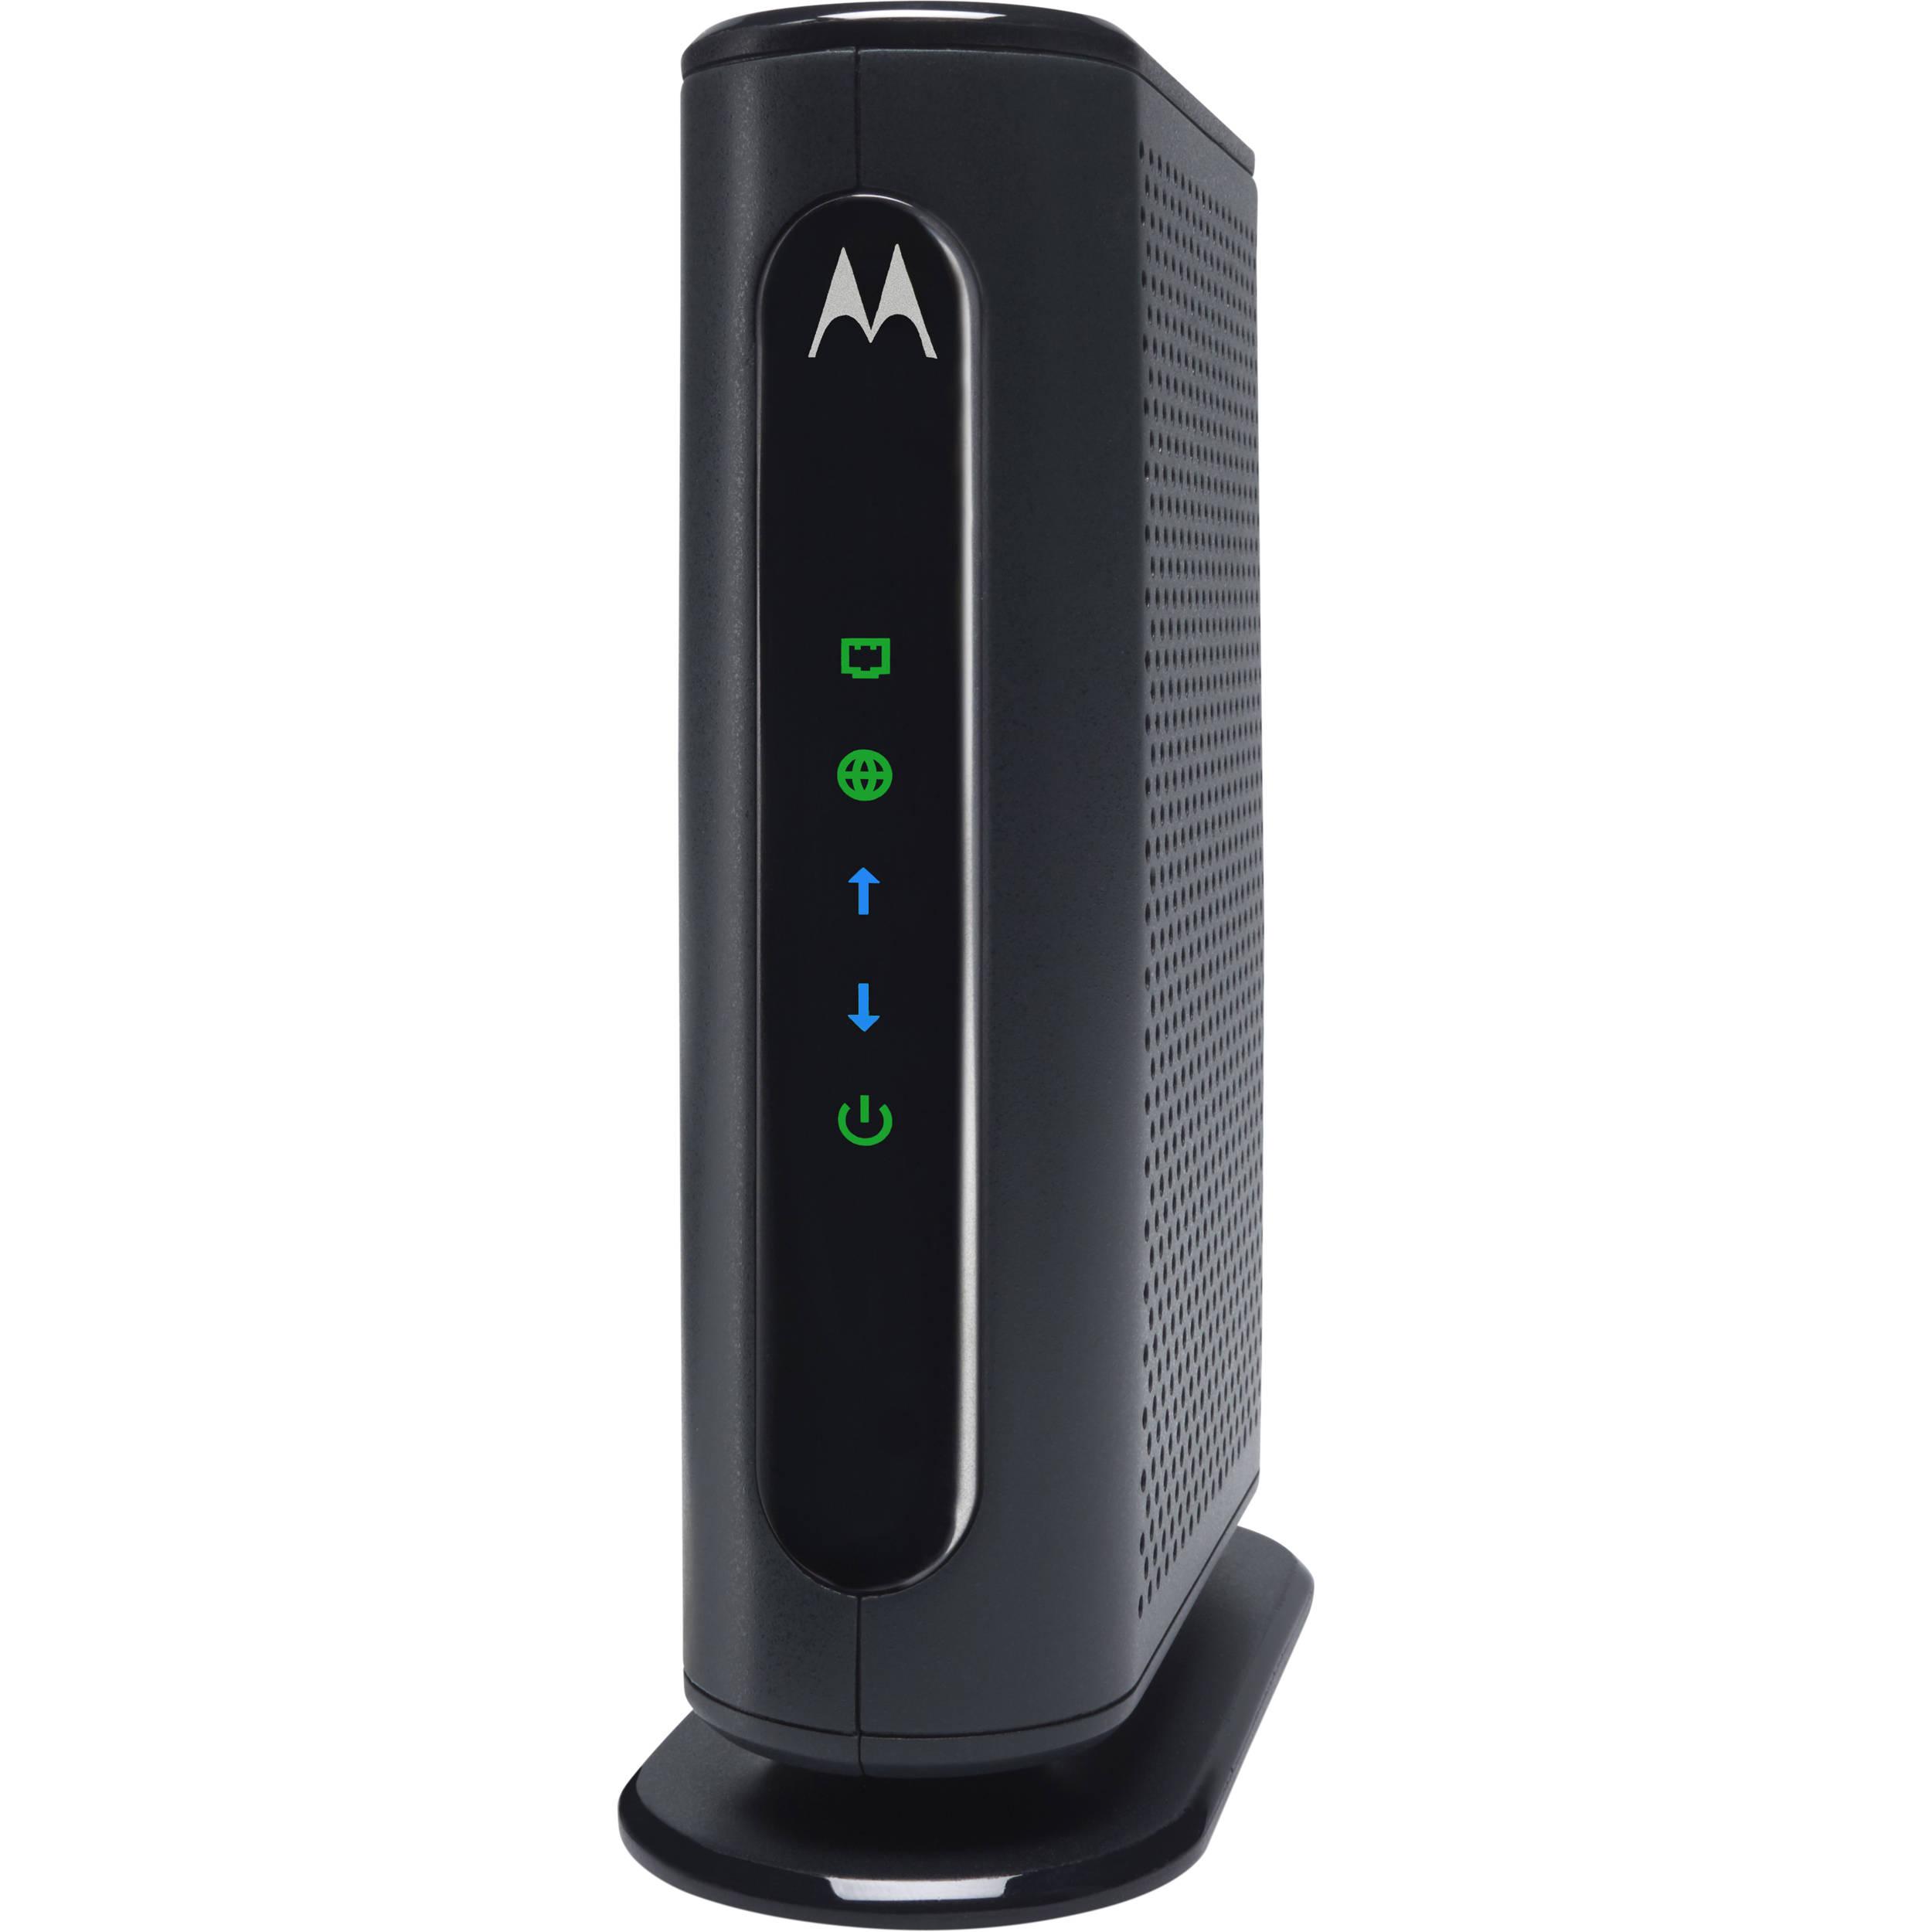 Motorola Mb7420 10 16x4 686 Mbps Docsis 3 0 Cable Modem